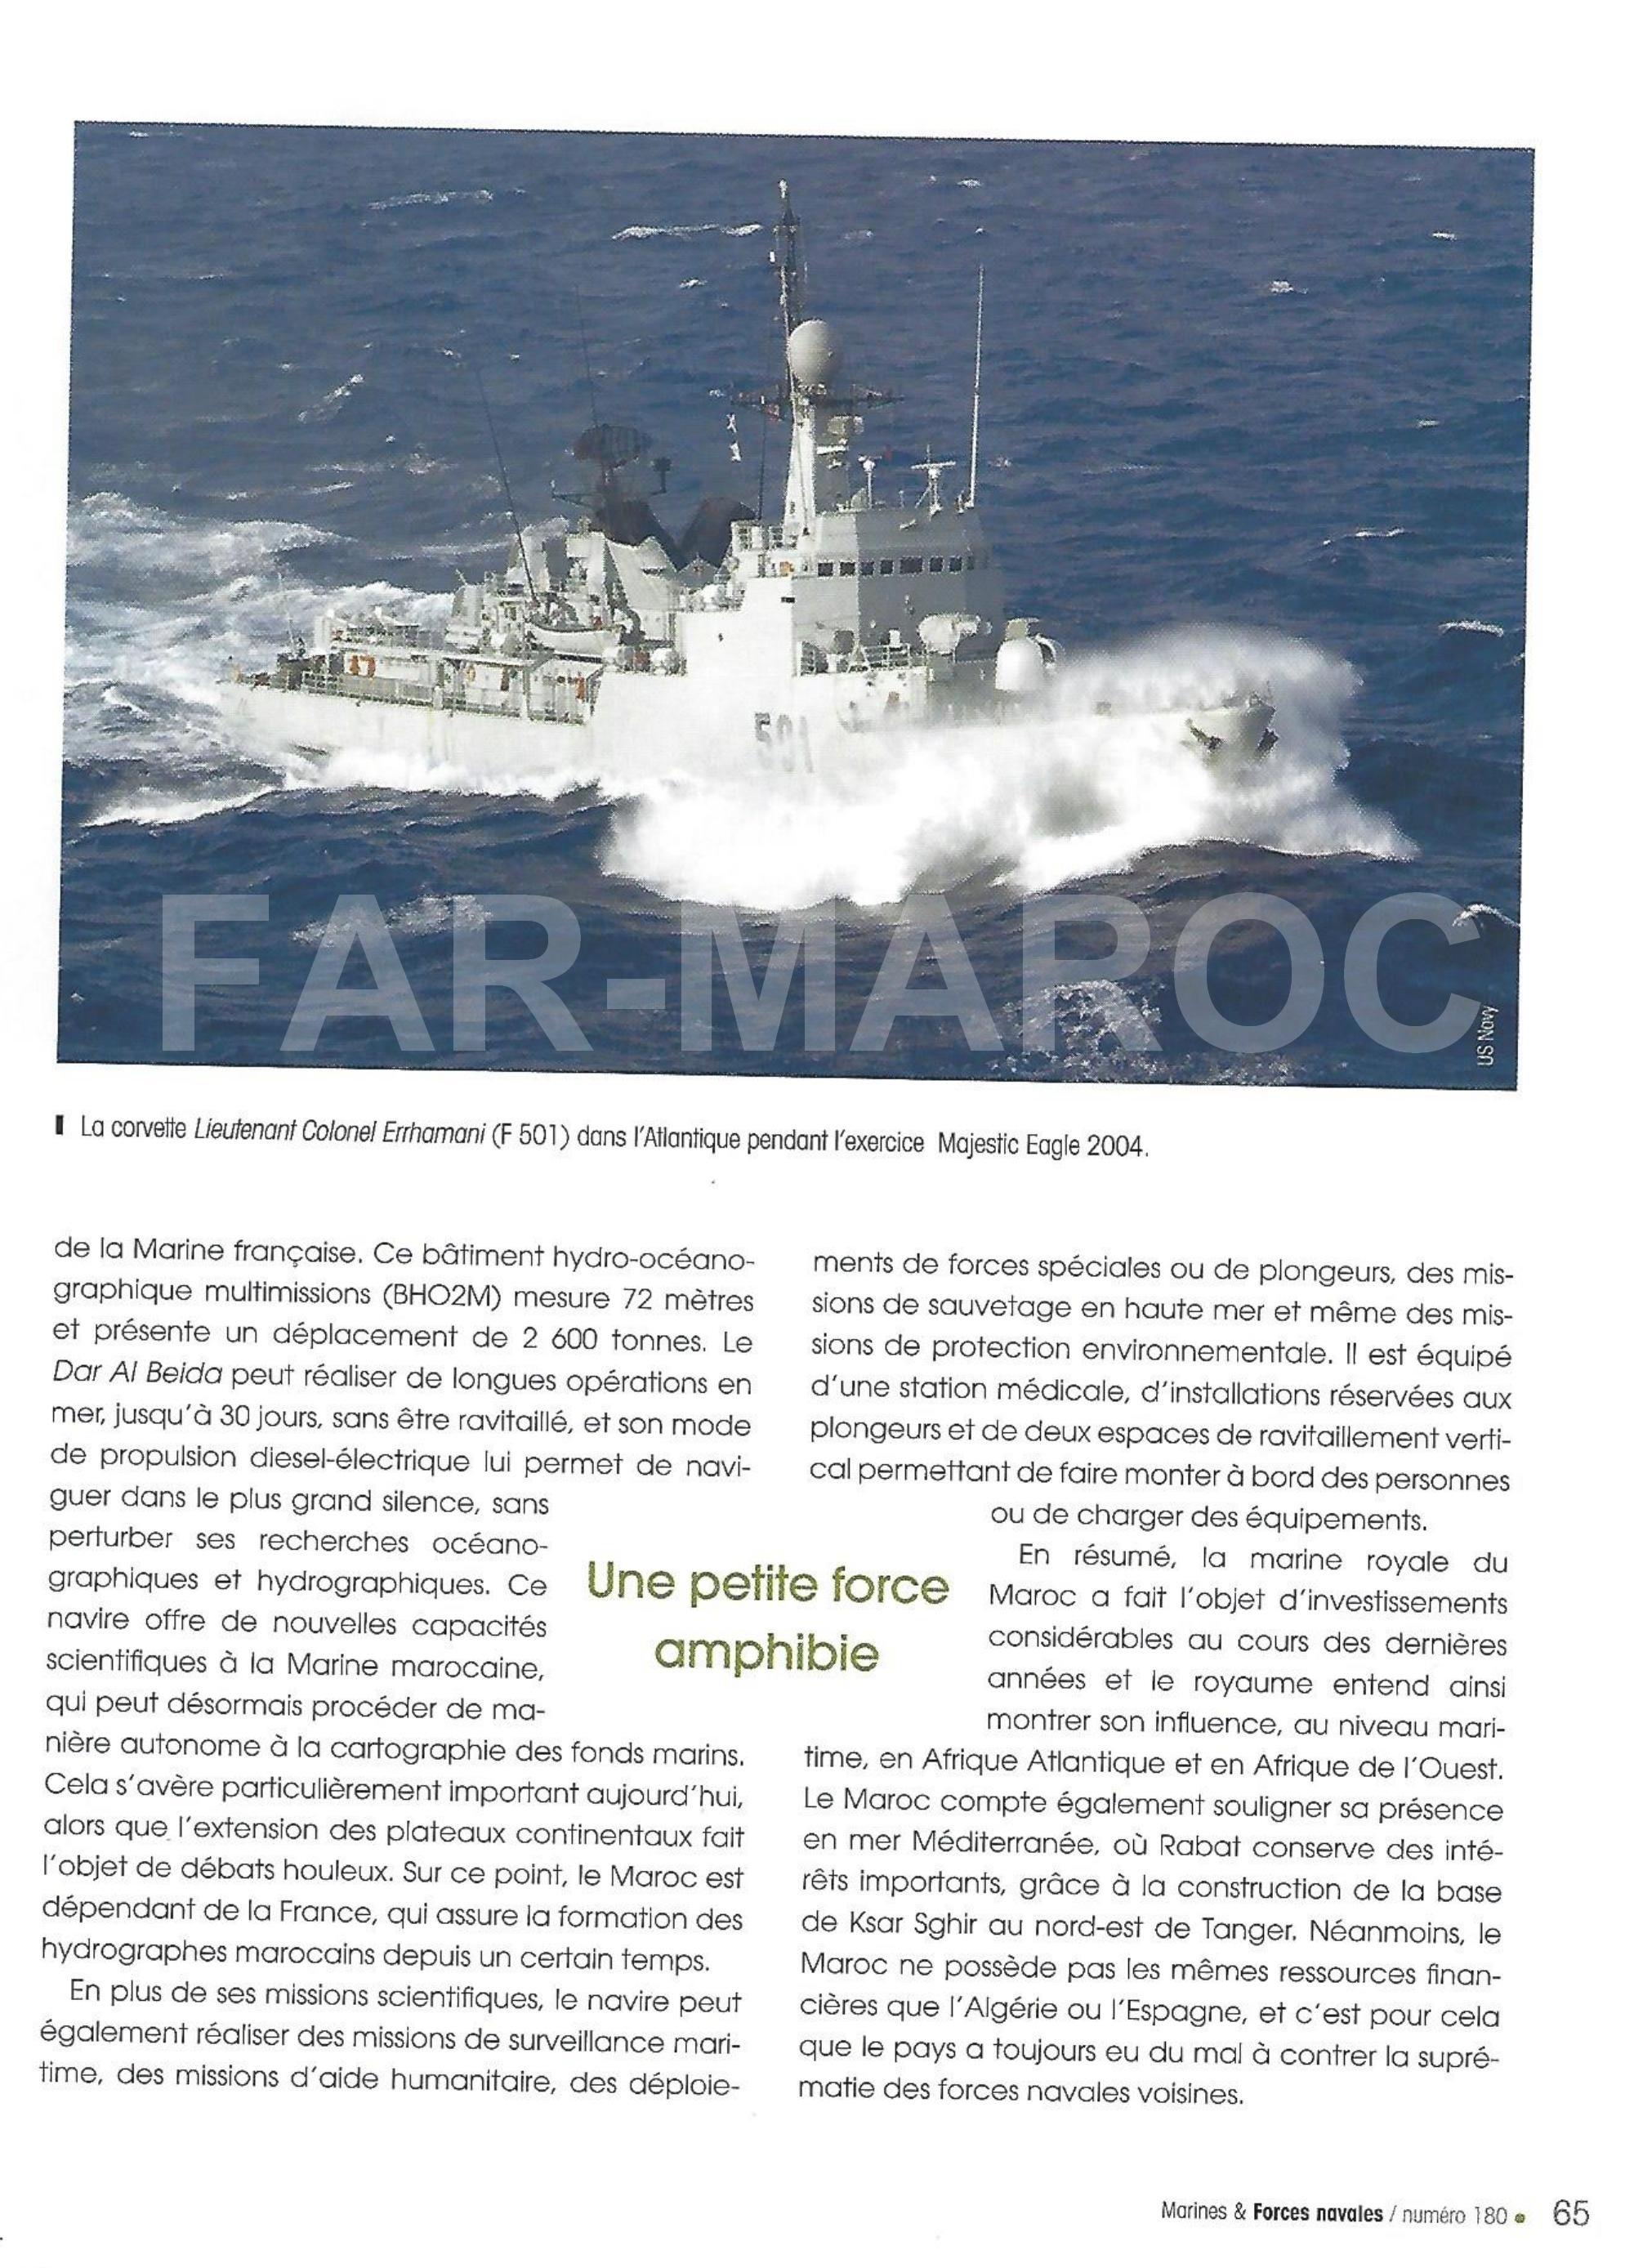 Articles à propos de la Marine Royale Marocaine 47598452931_e0ddd0e185_o